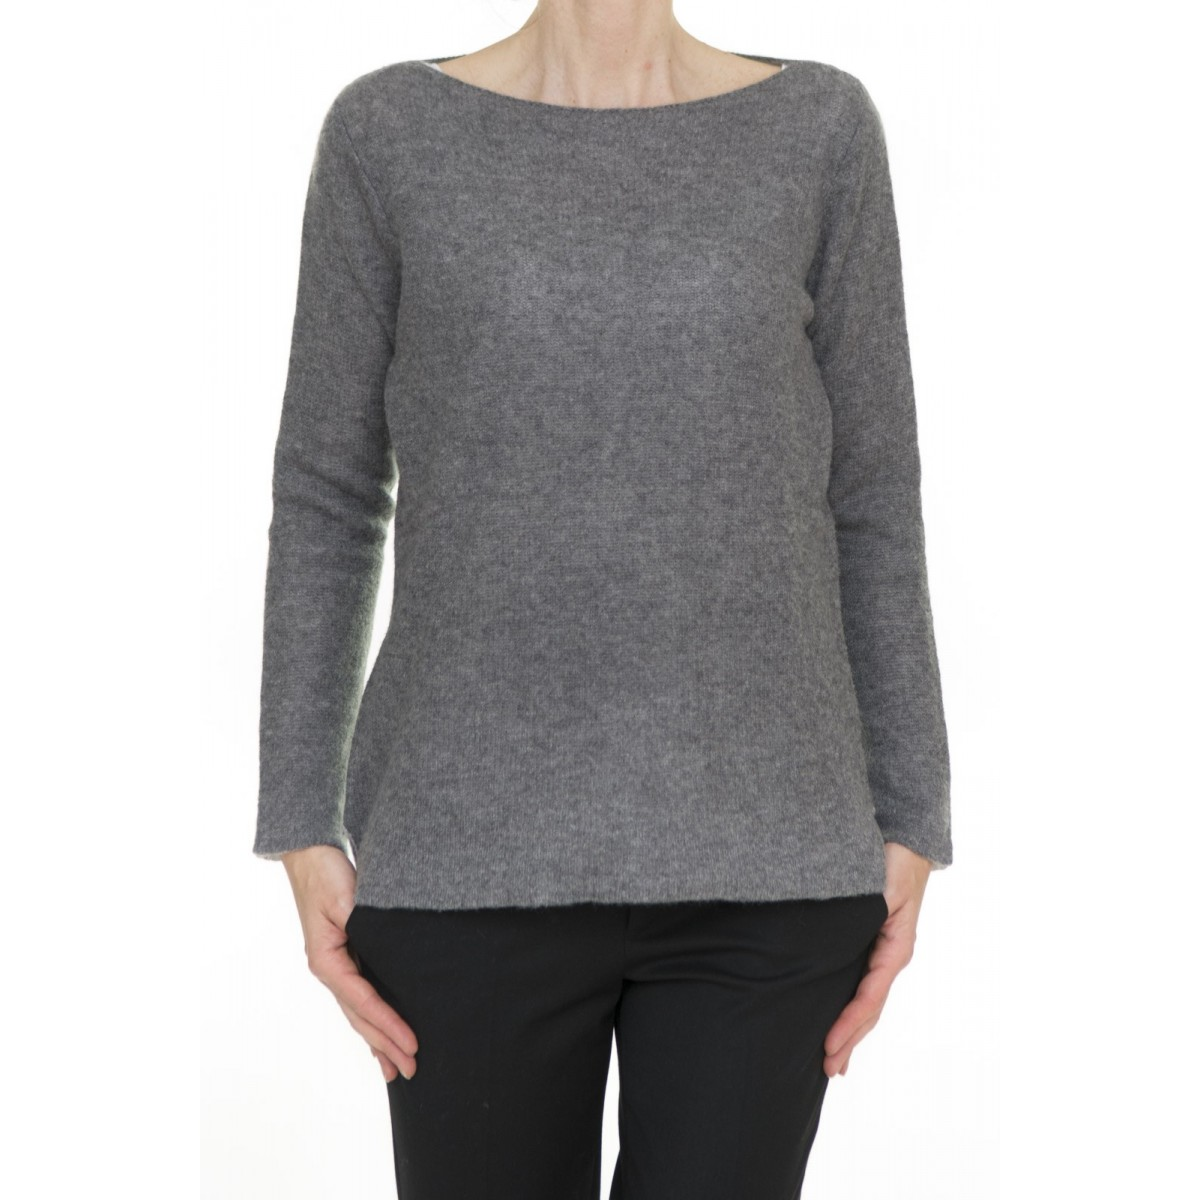 Maglia donna Kangra - 2640/13 maglia puro caschmeire garzata